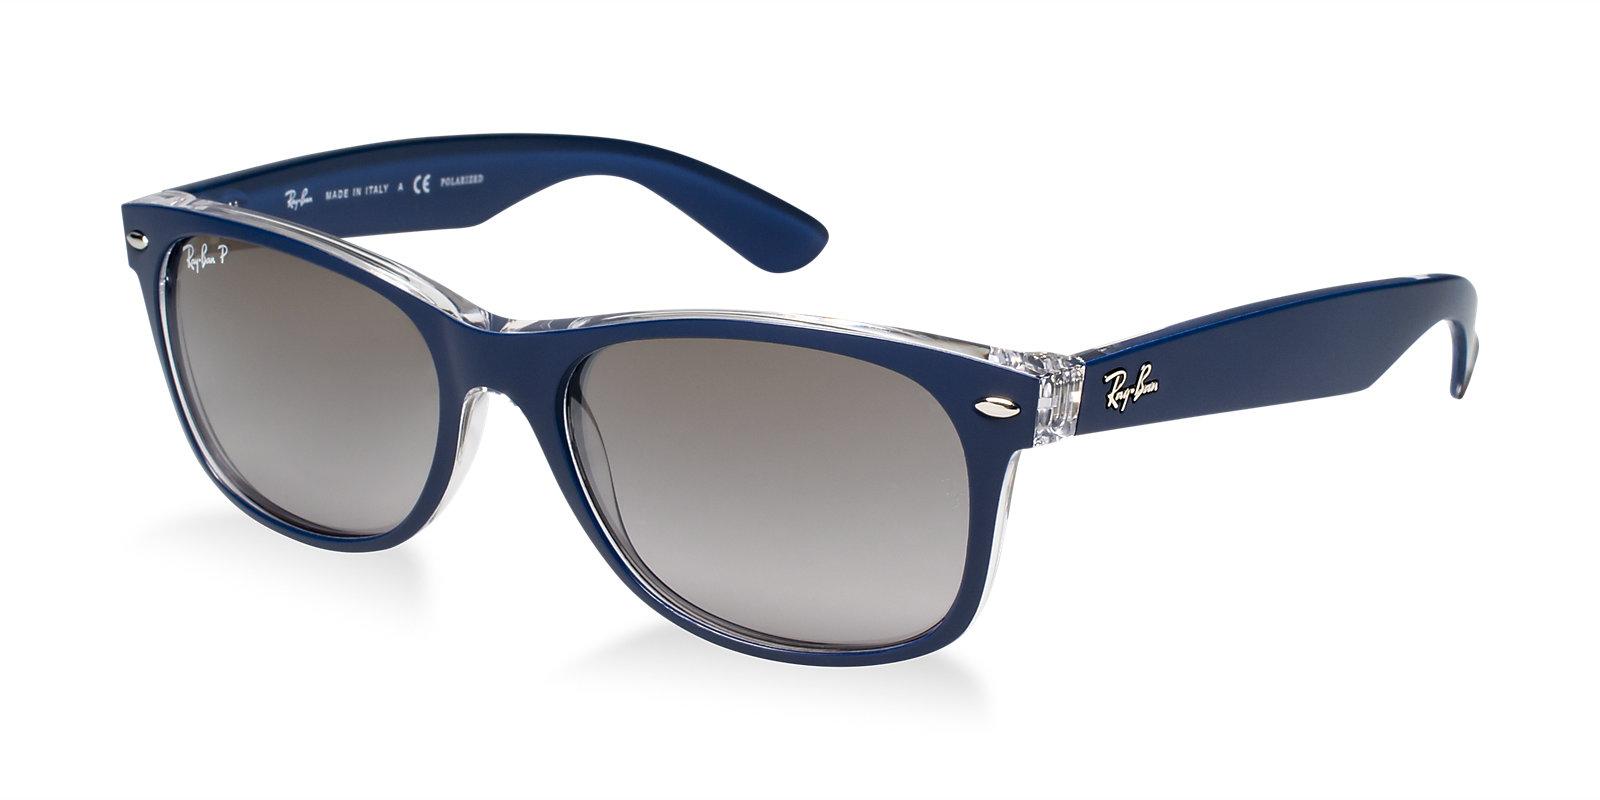 Polarized Wayfarer Sunglasses 44bu